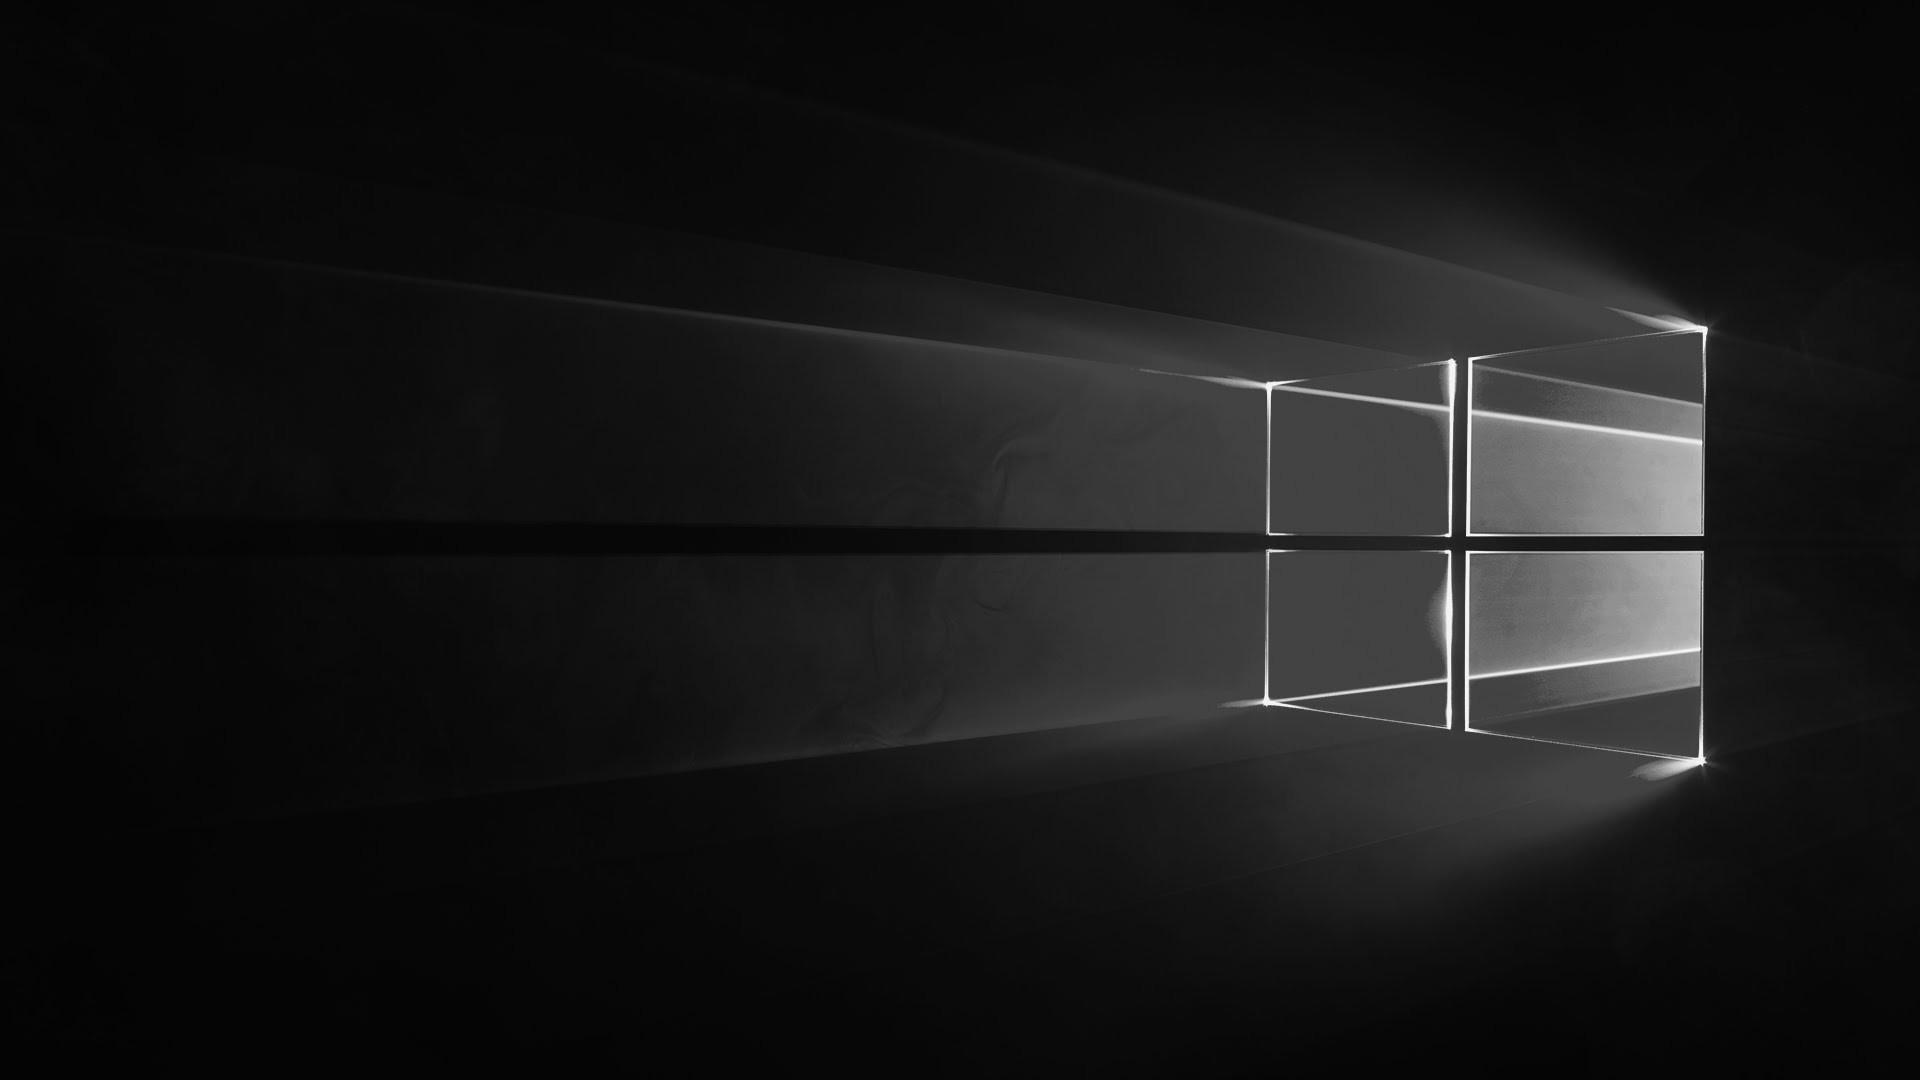 windows 10 black hd wallpaper